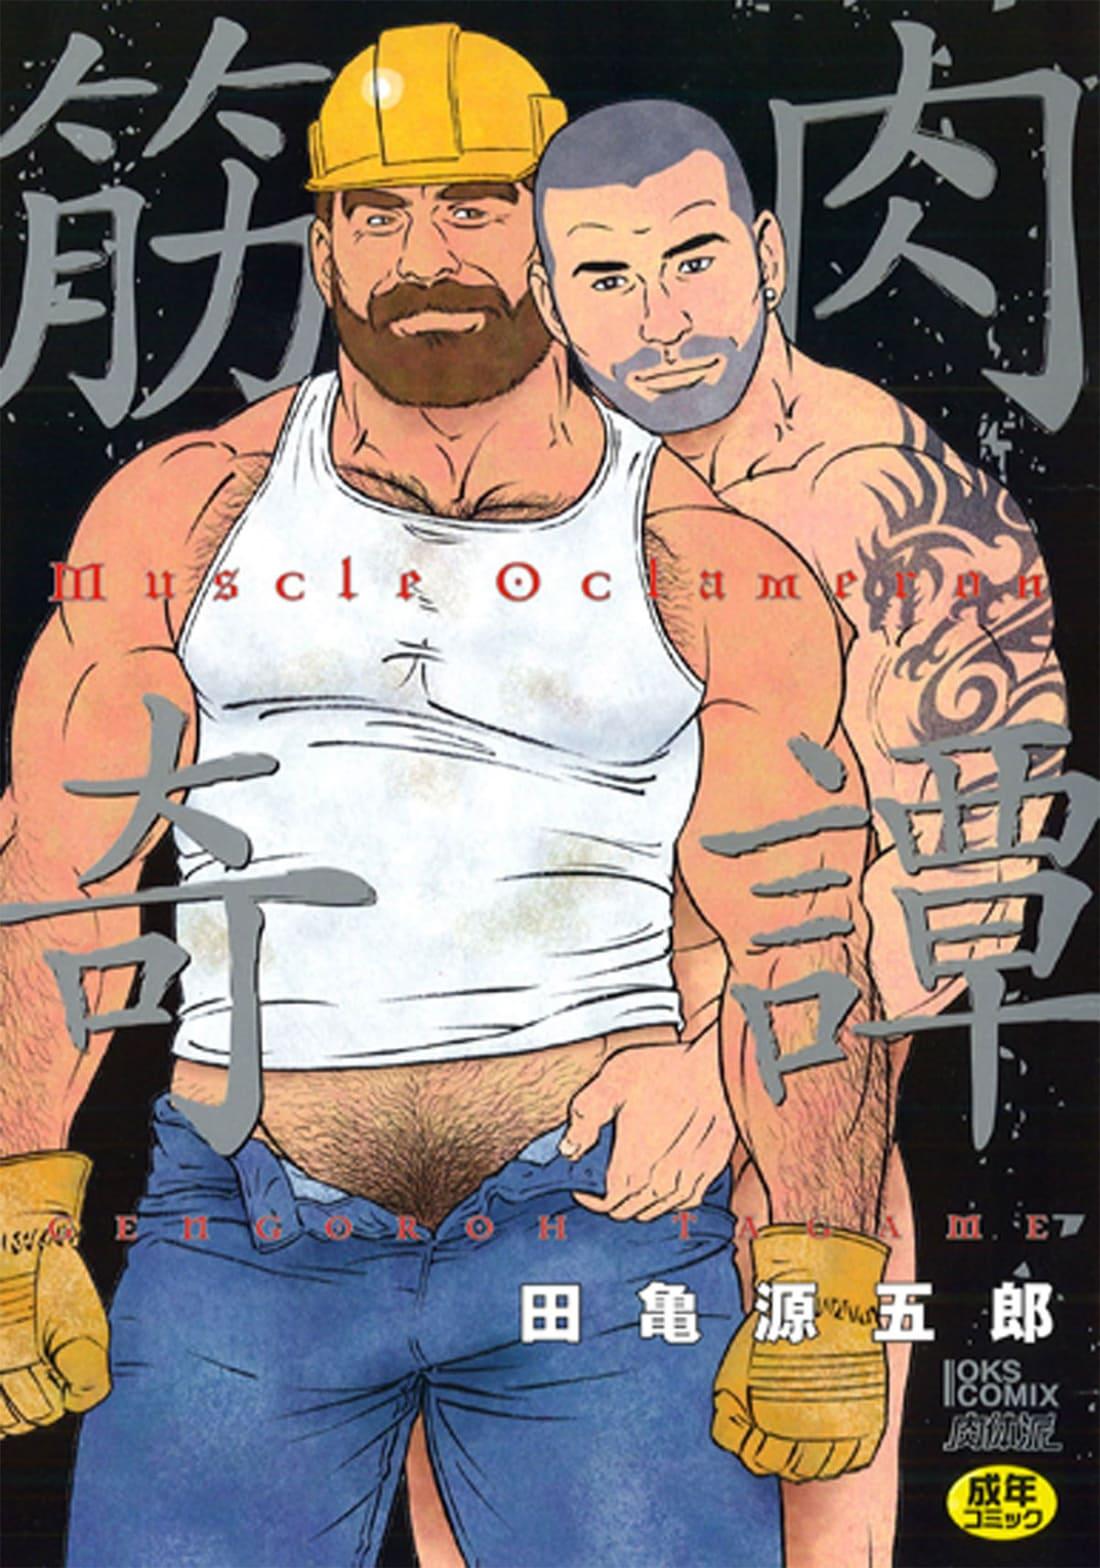 Kinniku Kitan Muscle Oclameron Comic by Gengoroh Tagame